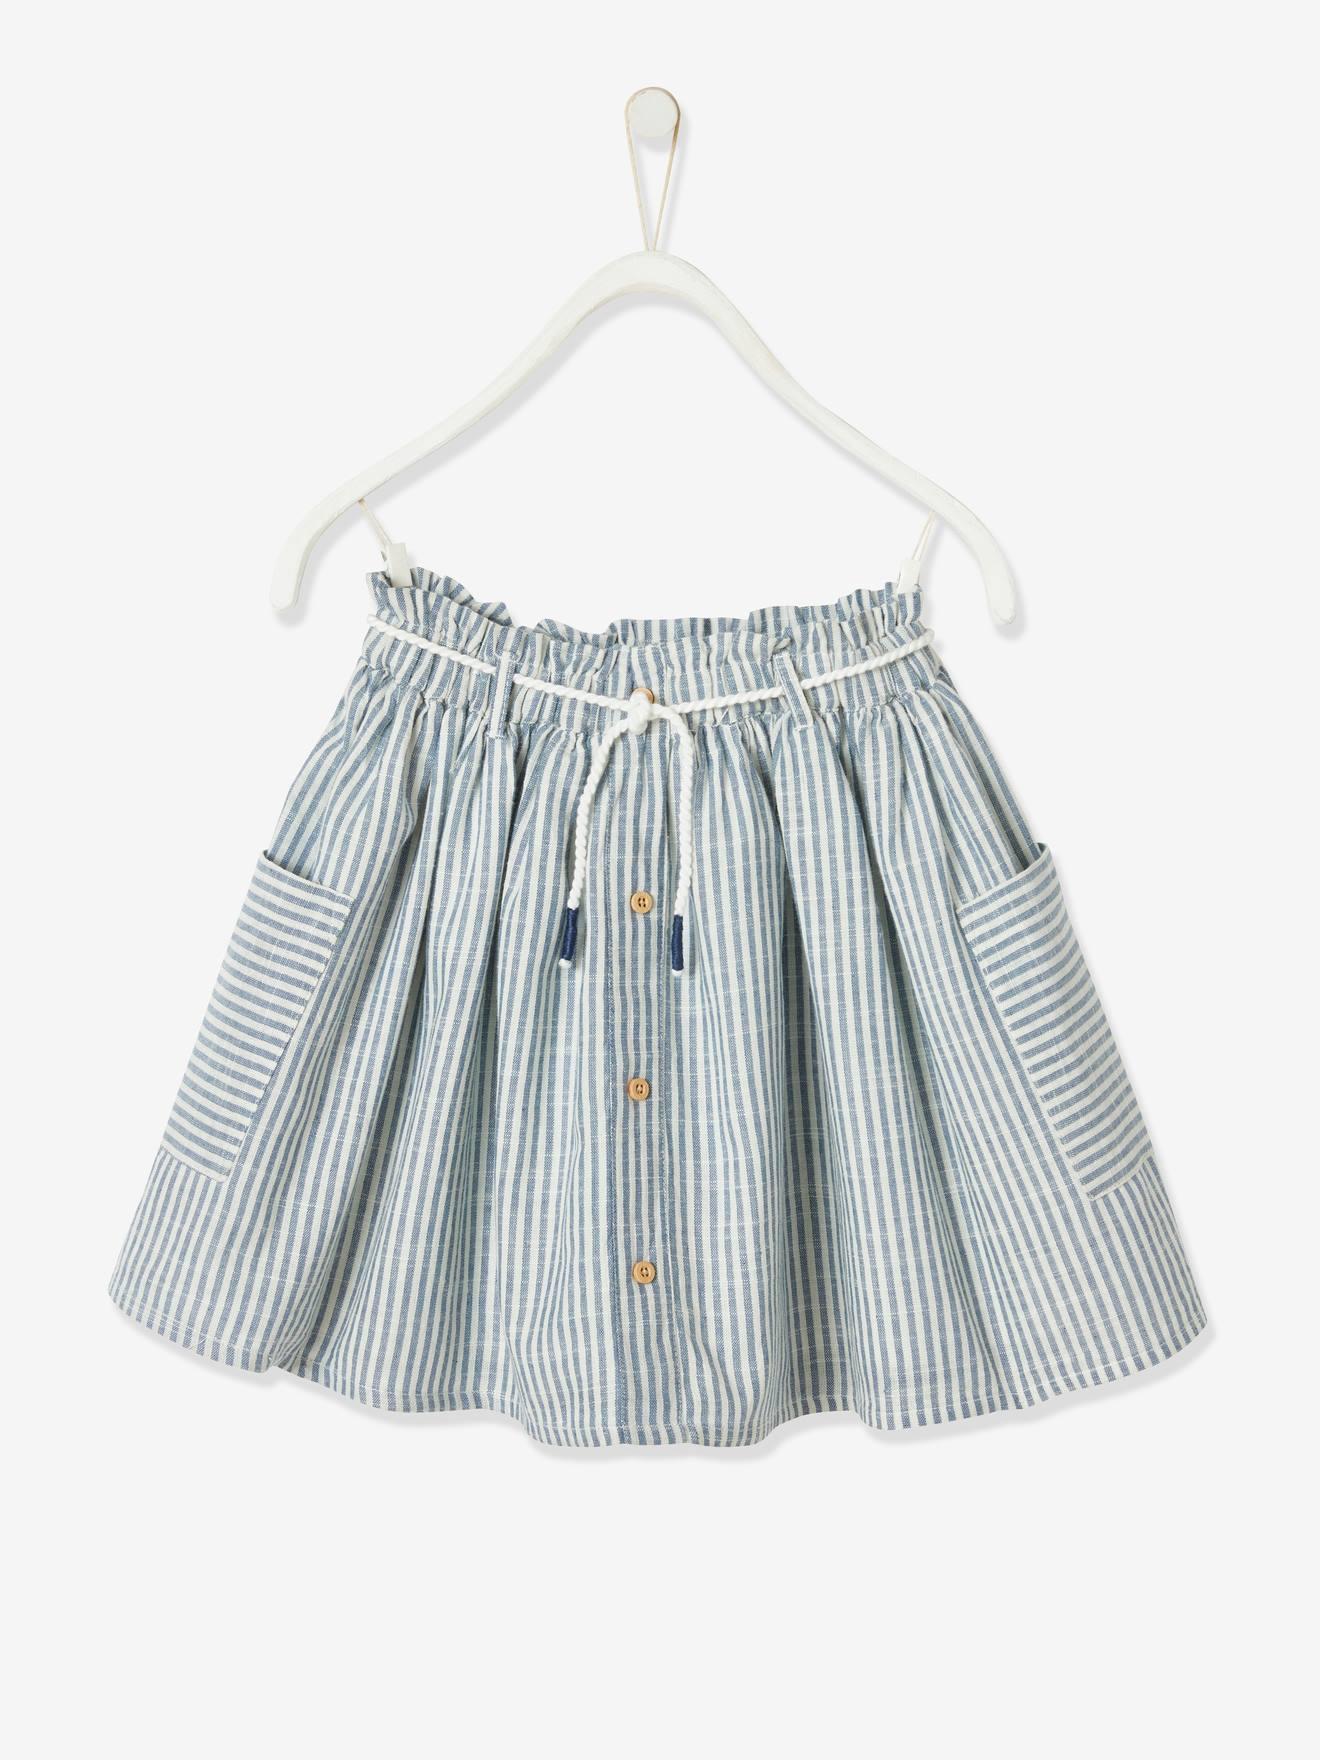 Ex M /& S Bébé Fille Chambray Denim Bleu Polka Dot Spot robe-tablier 0-24 mois